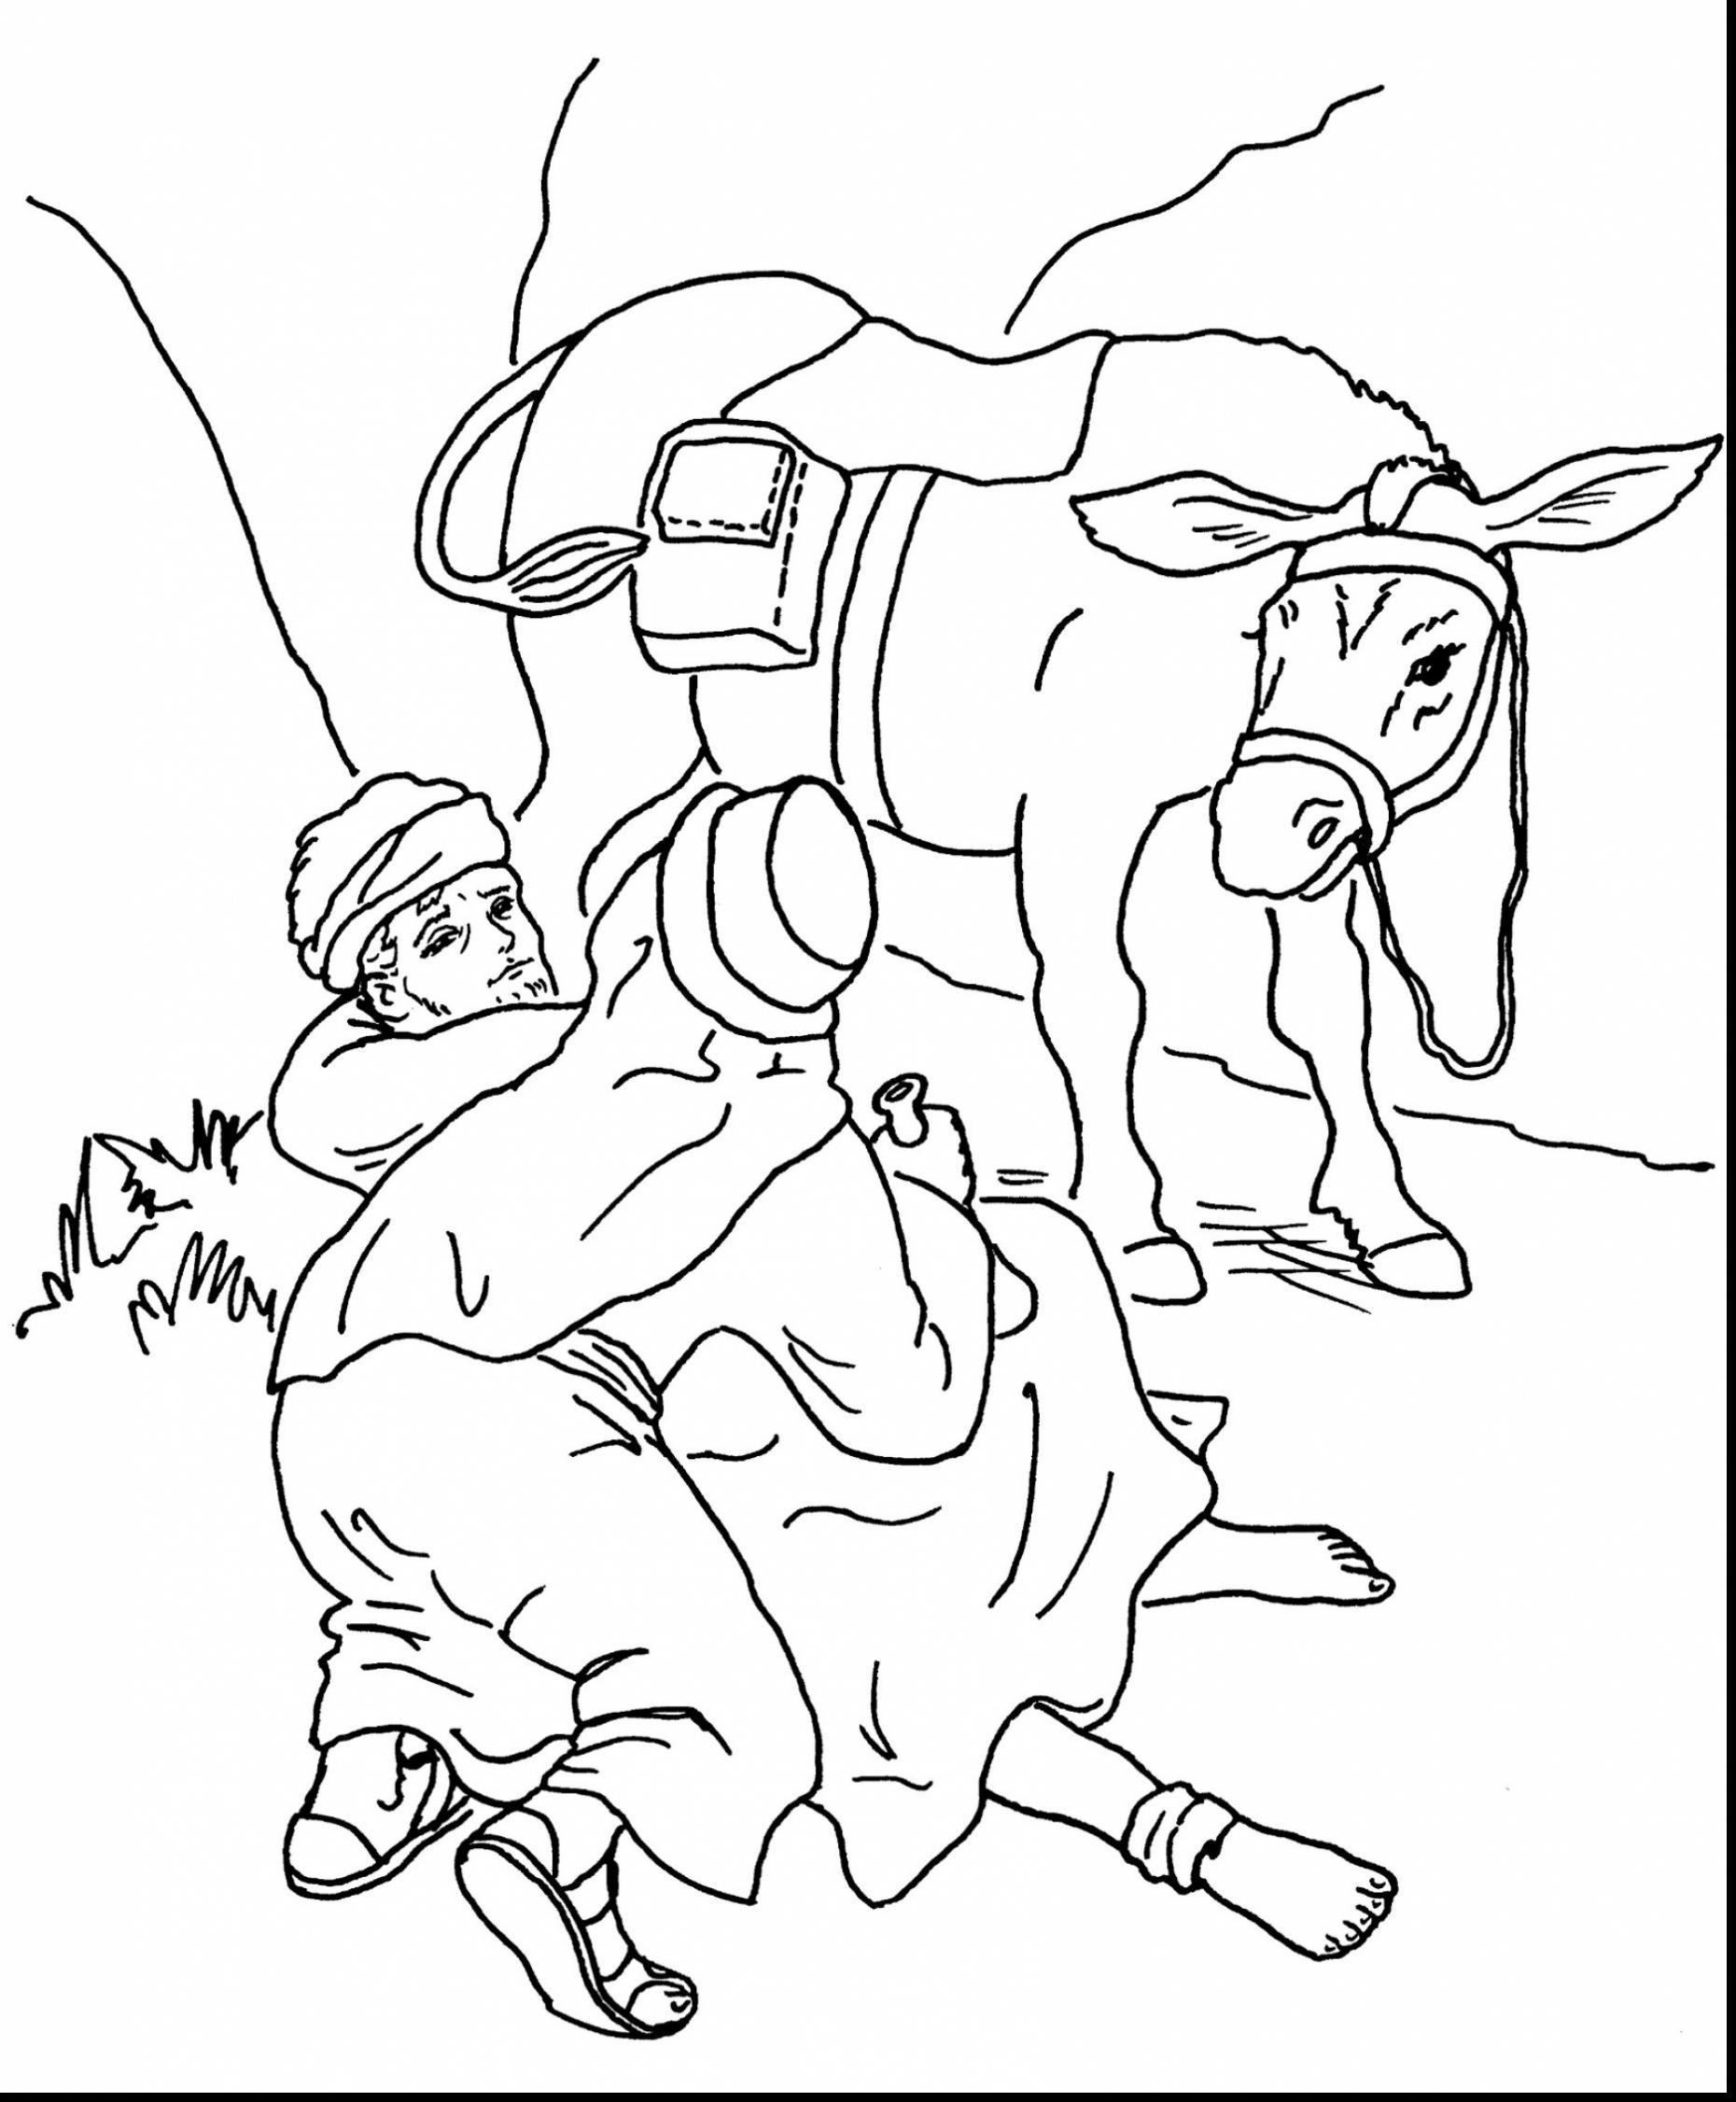 Good Samaritan Drawing at GetDrawings